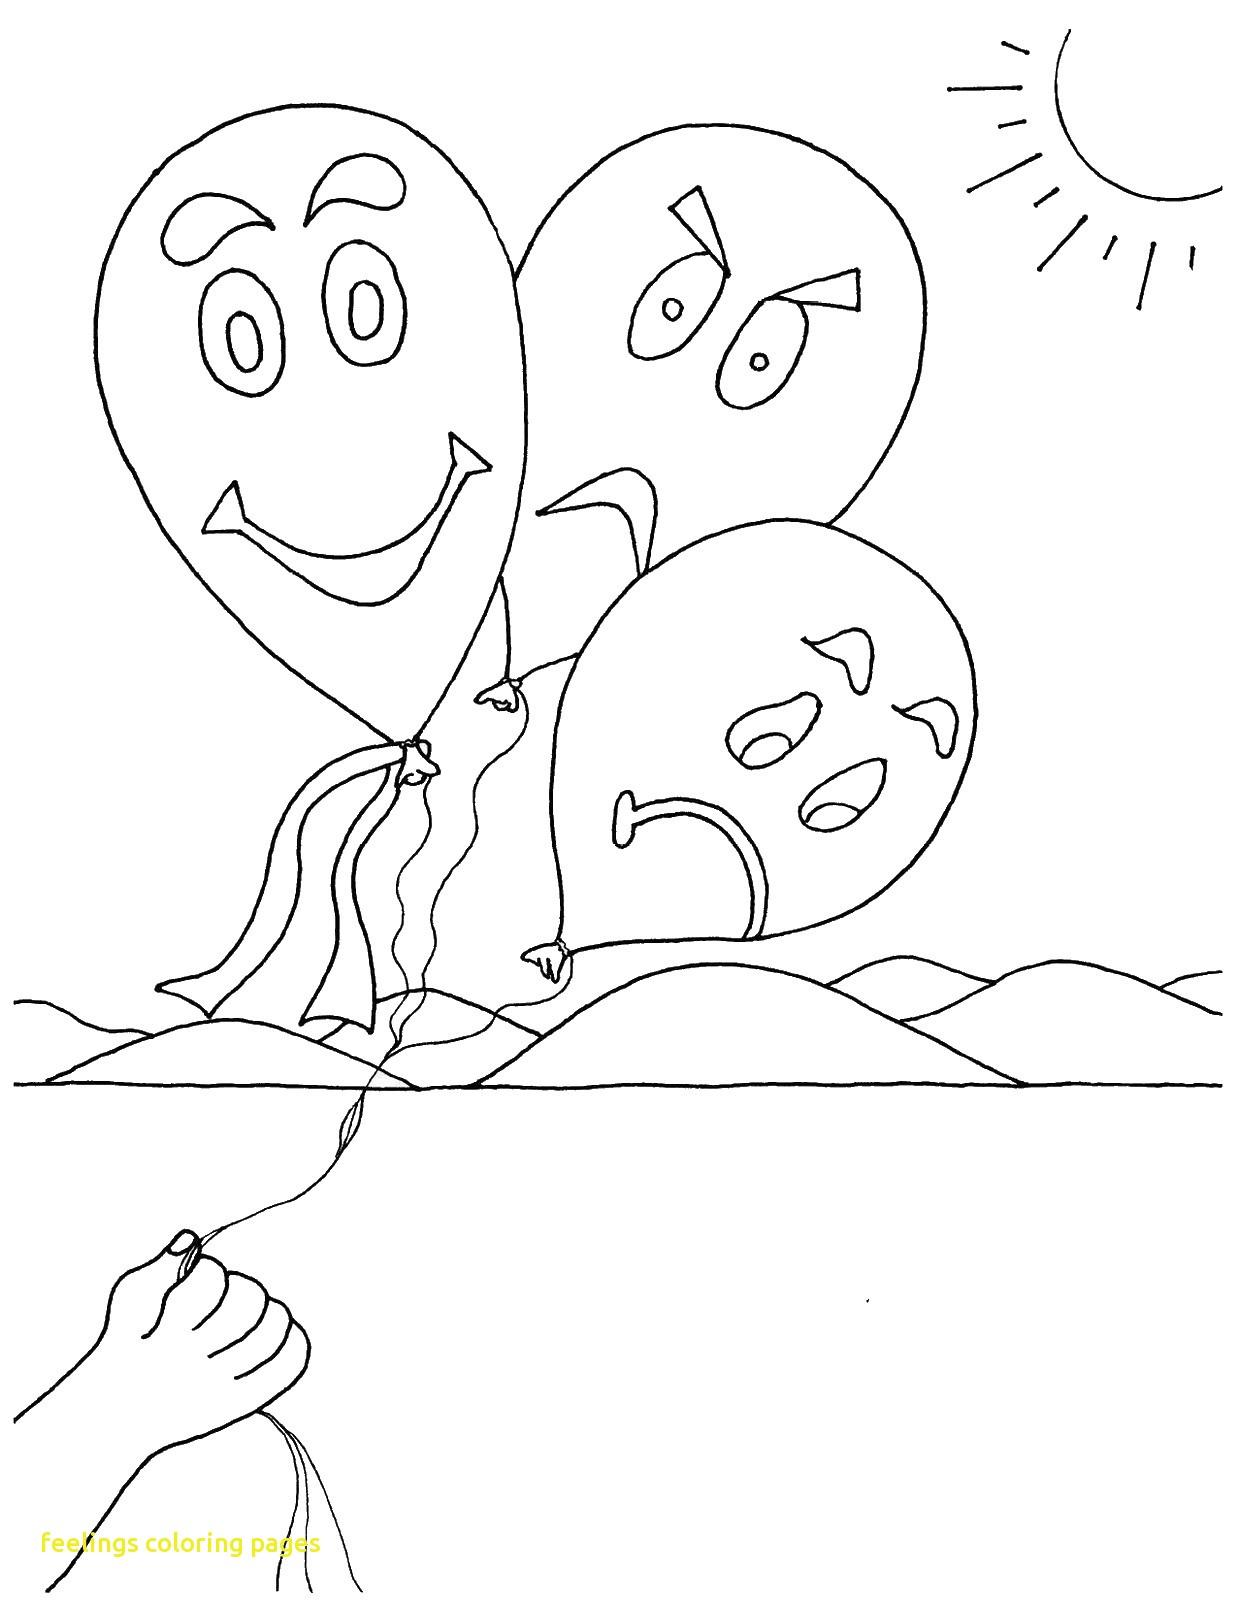 Feelings Coloring Pages At Getdrawings